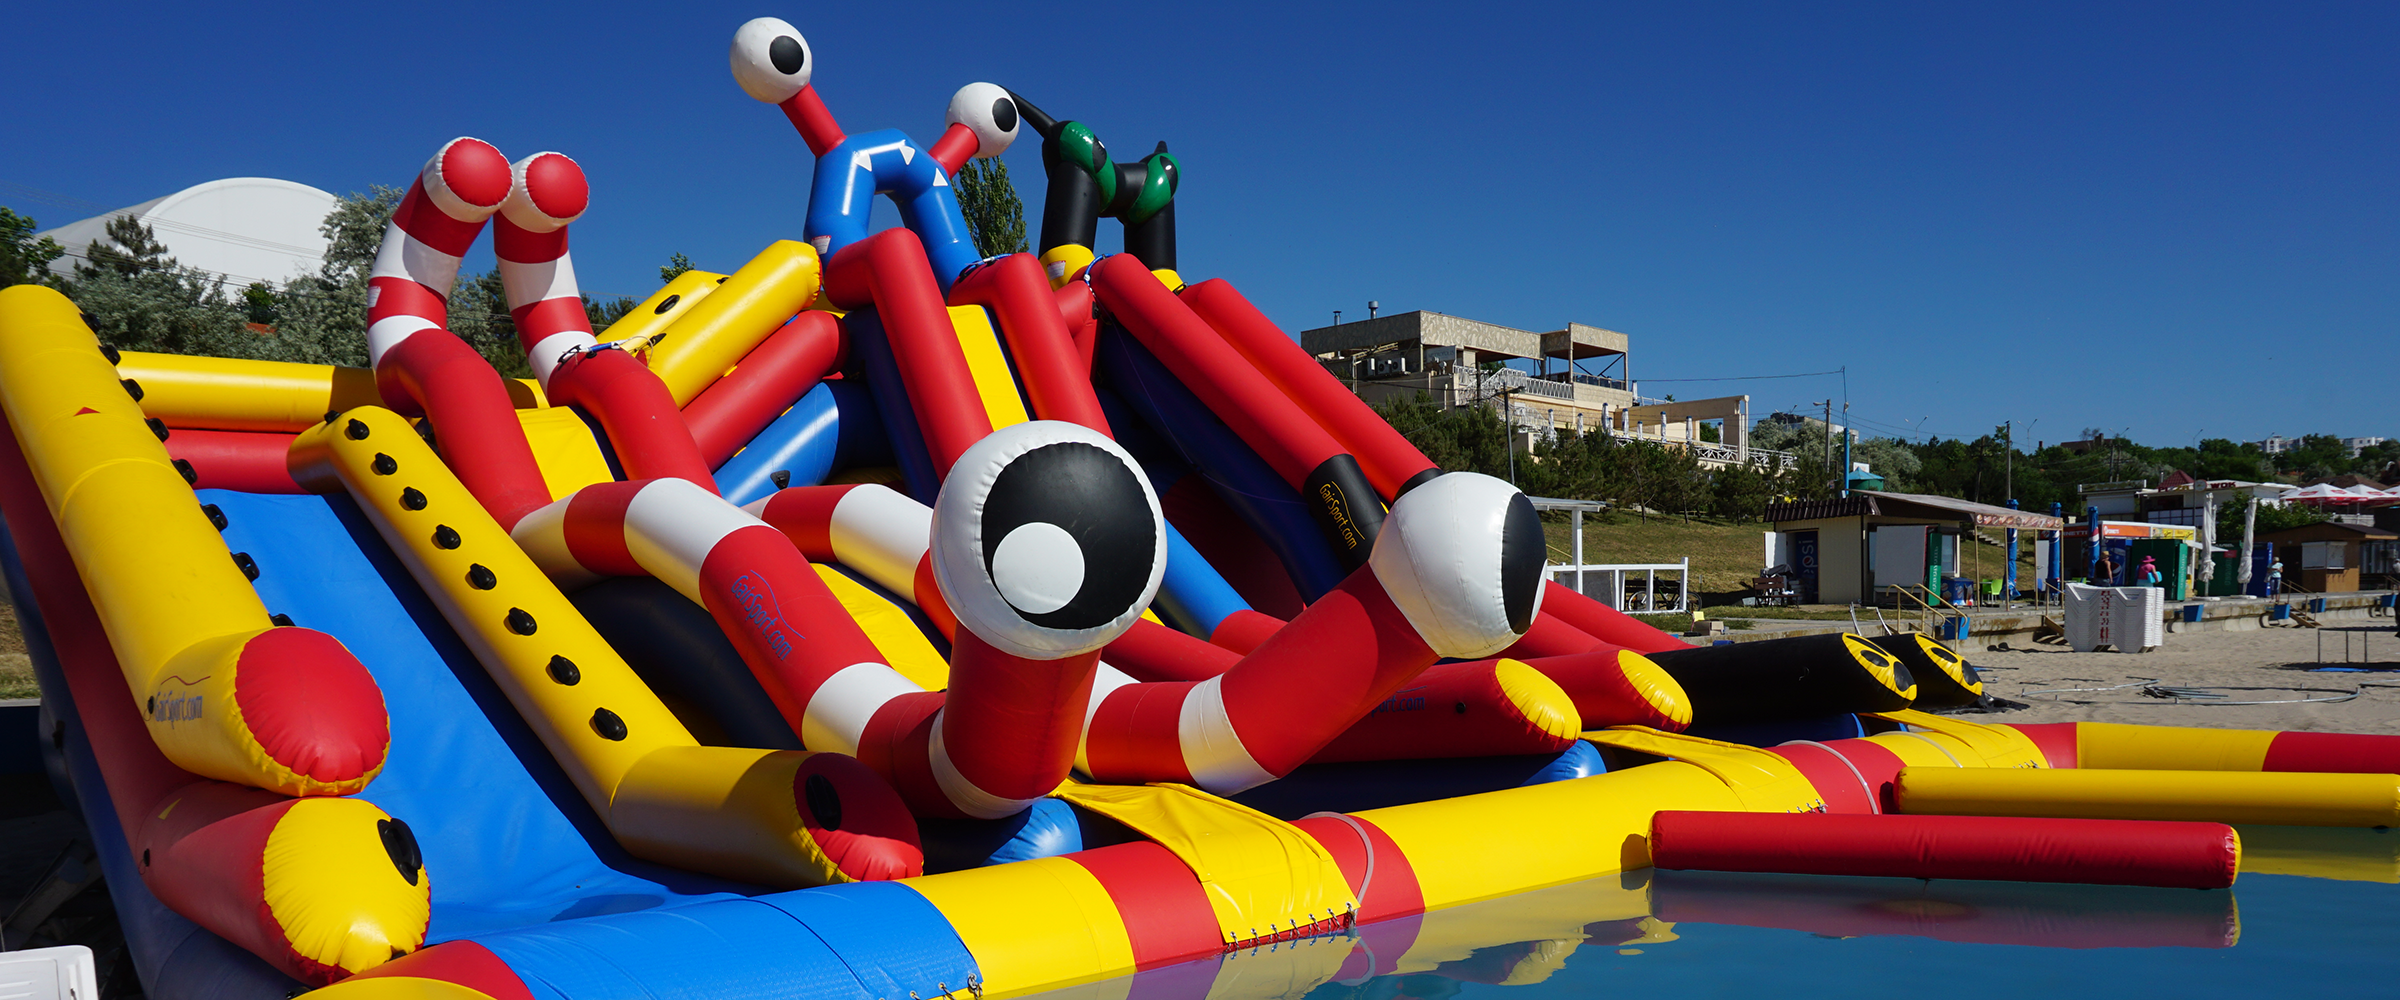 Надувной аквапарк с тремя горками и надувным пандусом Inflatable water park with inflatable ramp GAIRSPORT 1